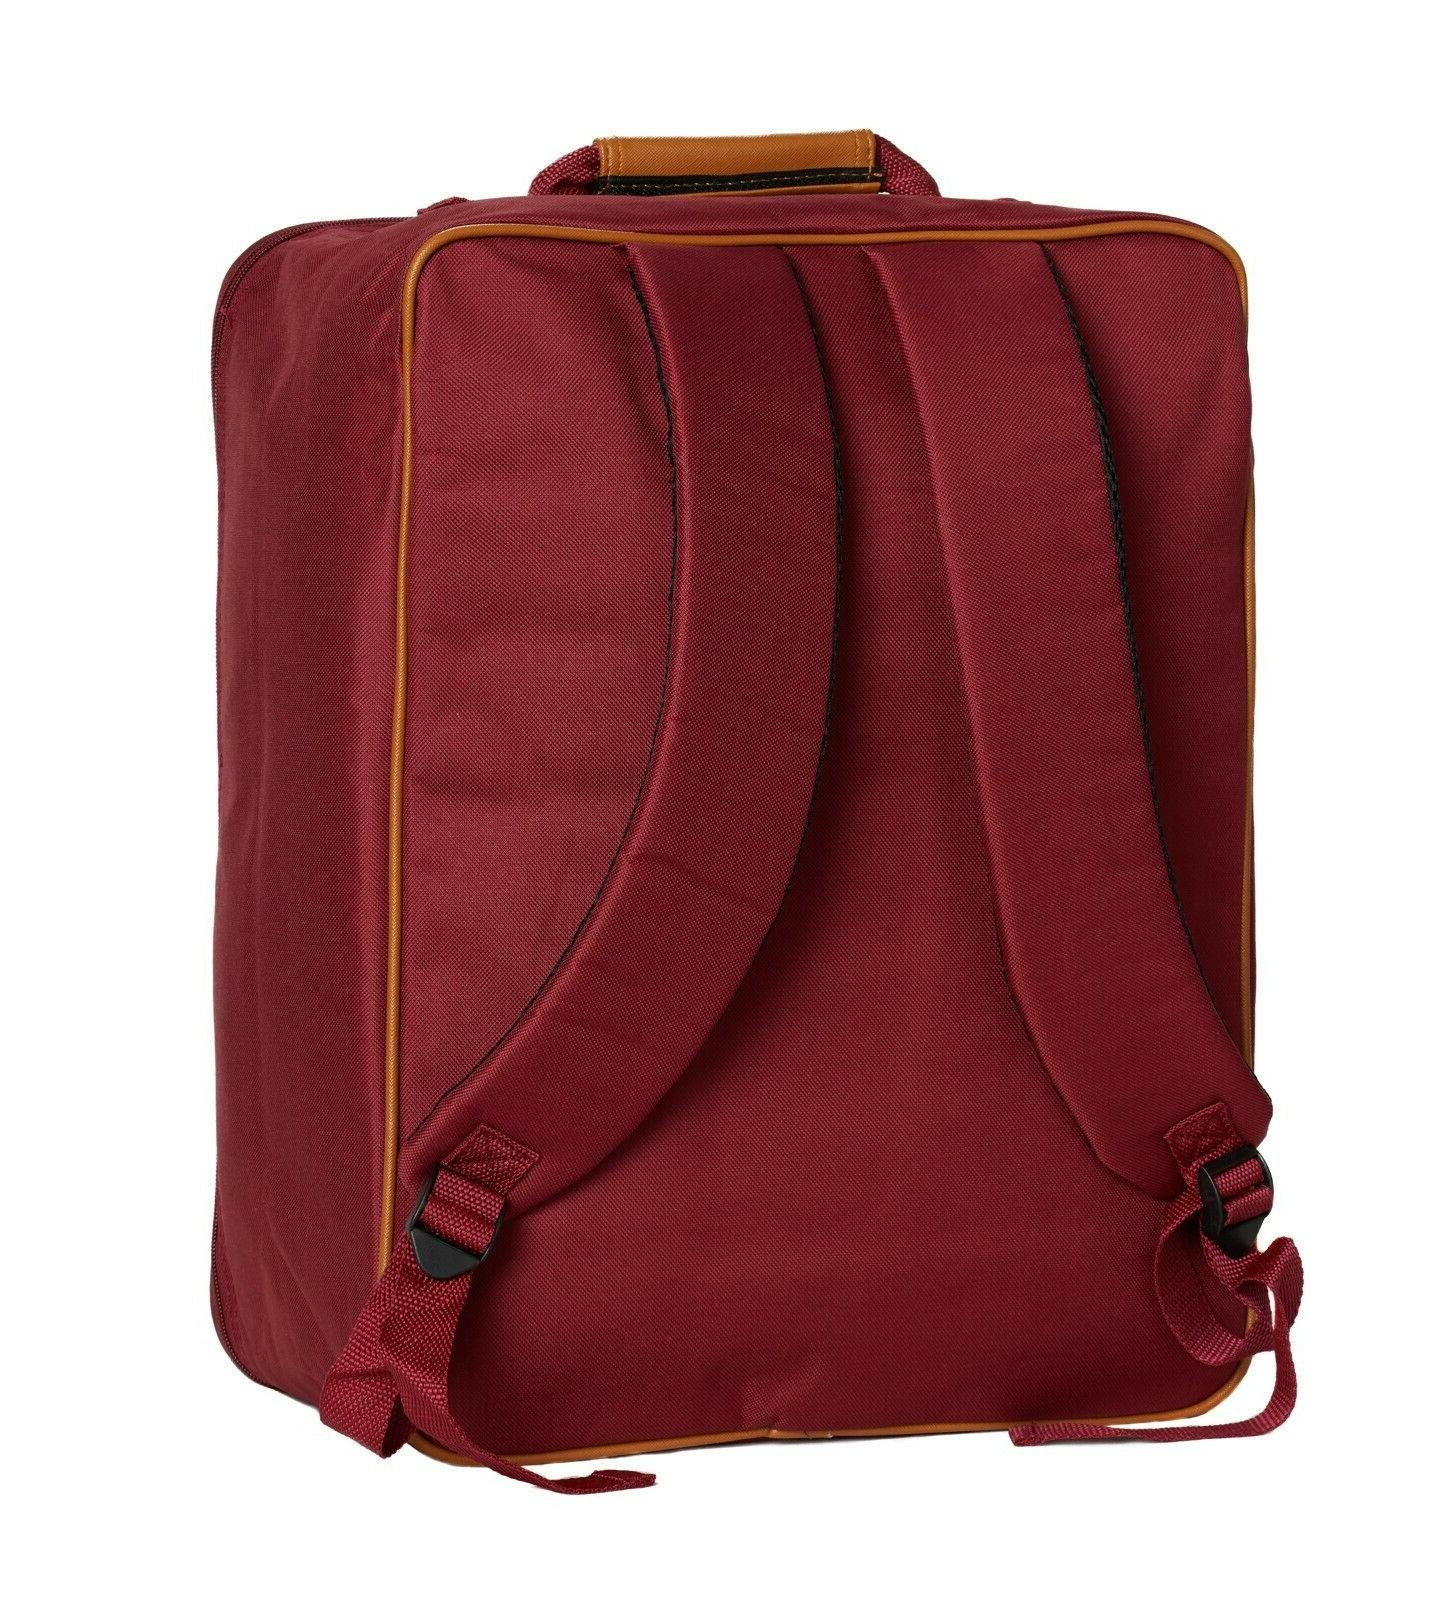 "Spirit Item Bag 18"" 14"" Carry On Duffel"